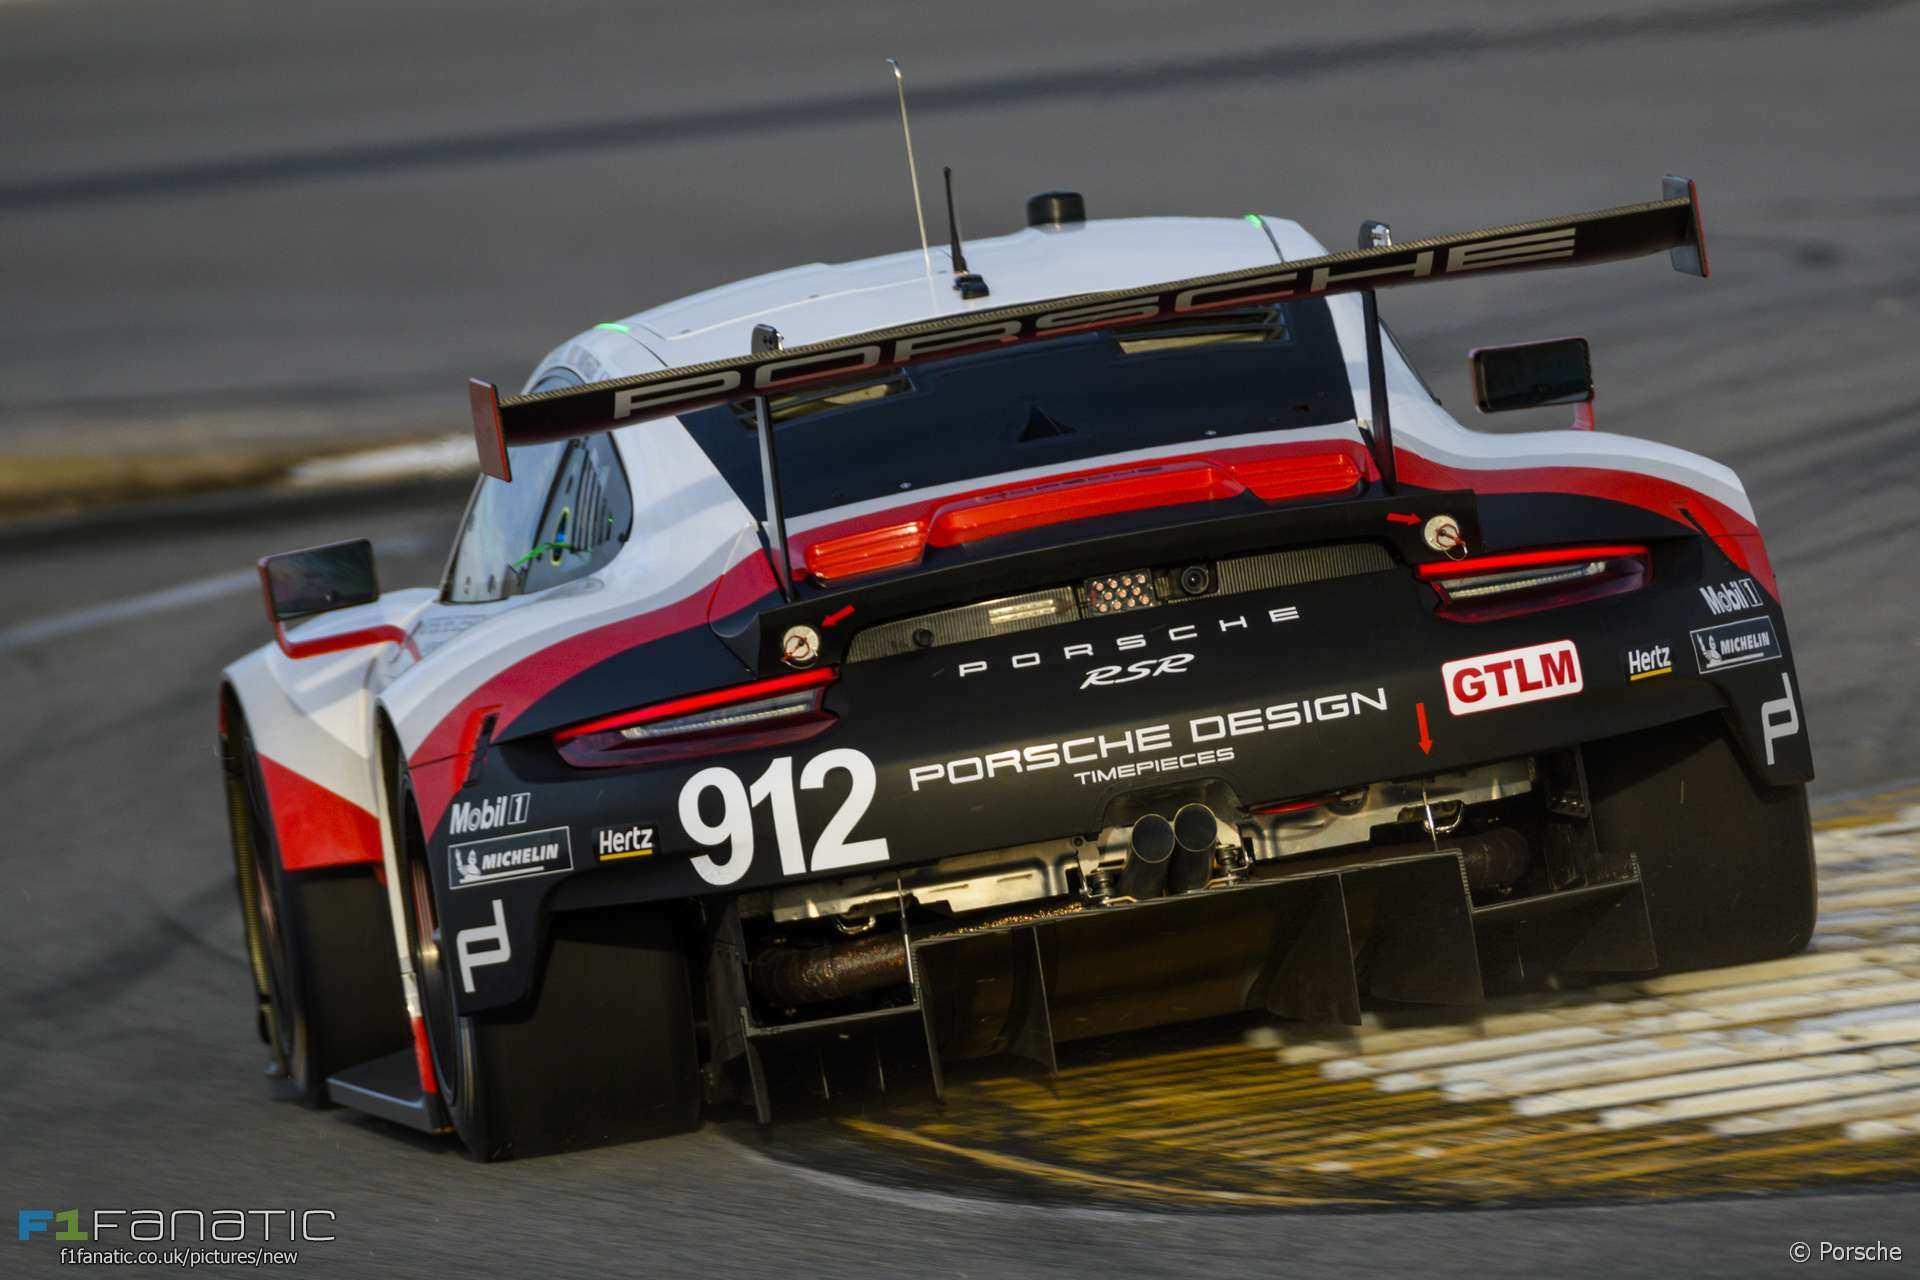 25 Gallery of Porsche F1 2020 Photos by Porsche F1 2020